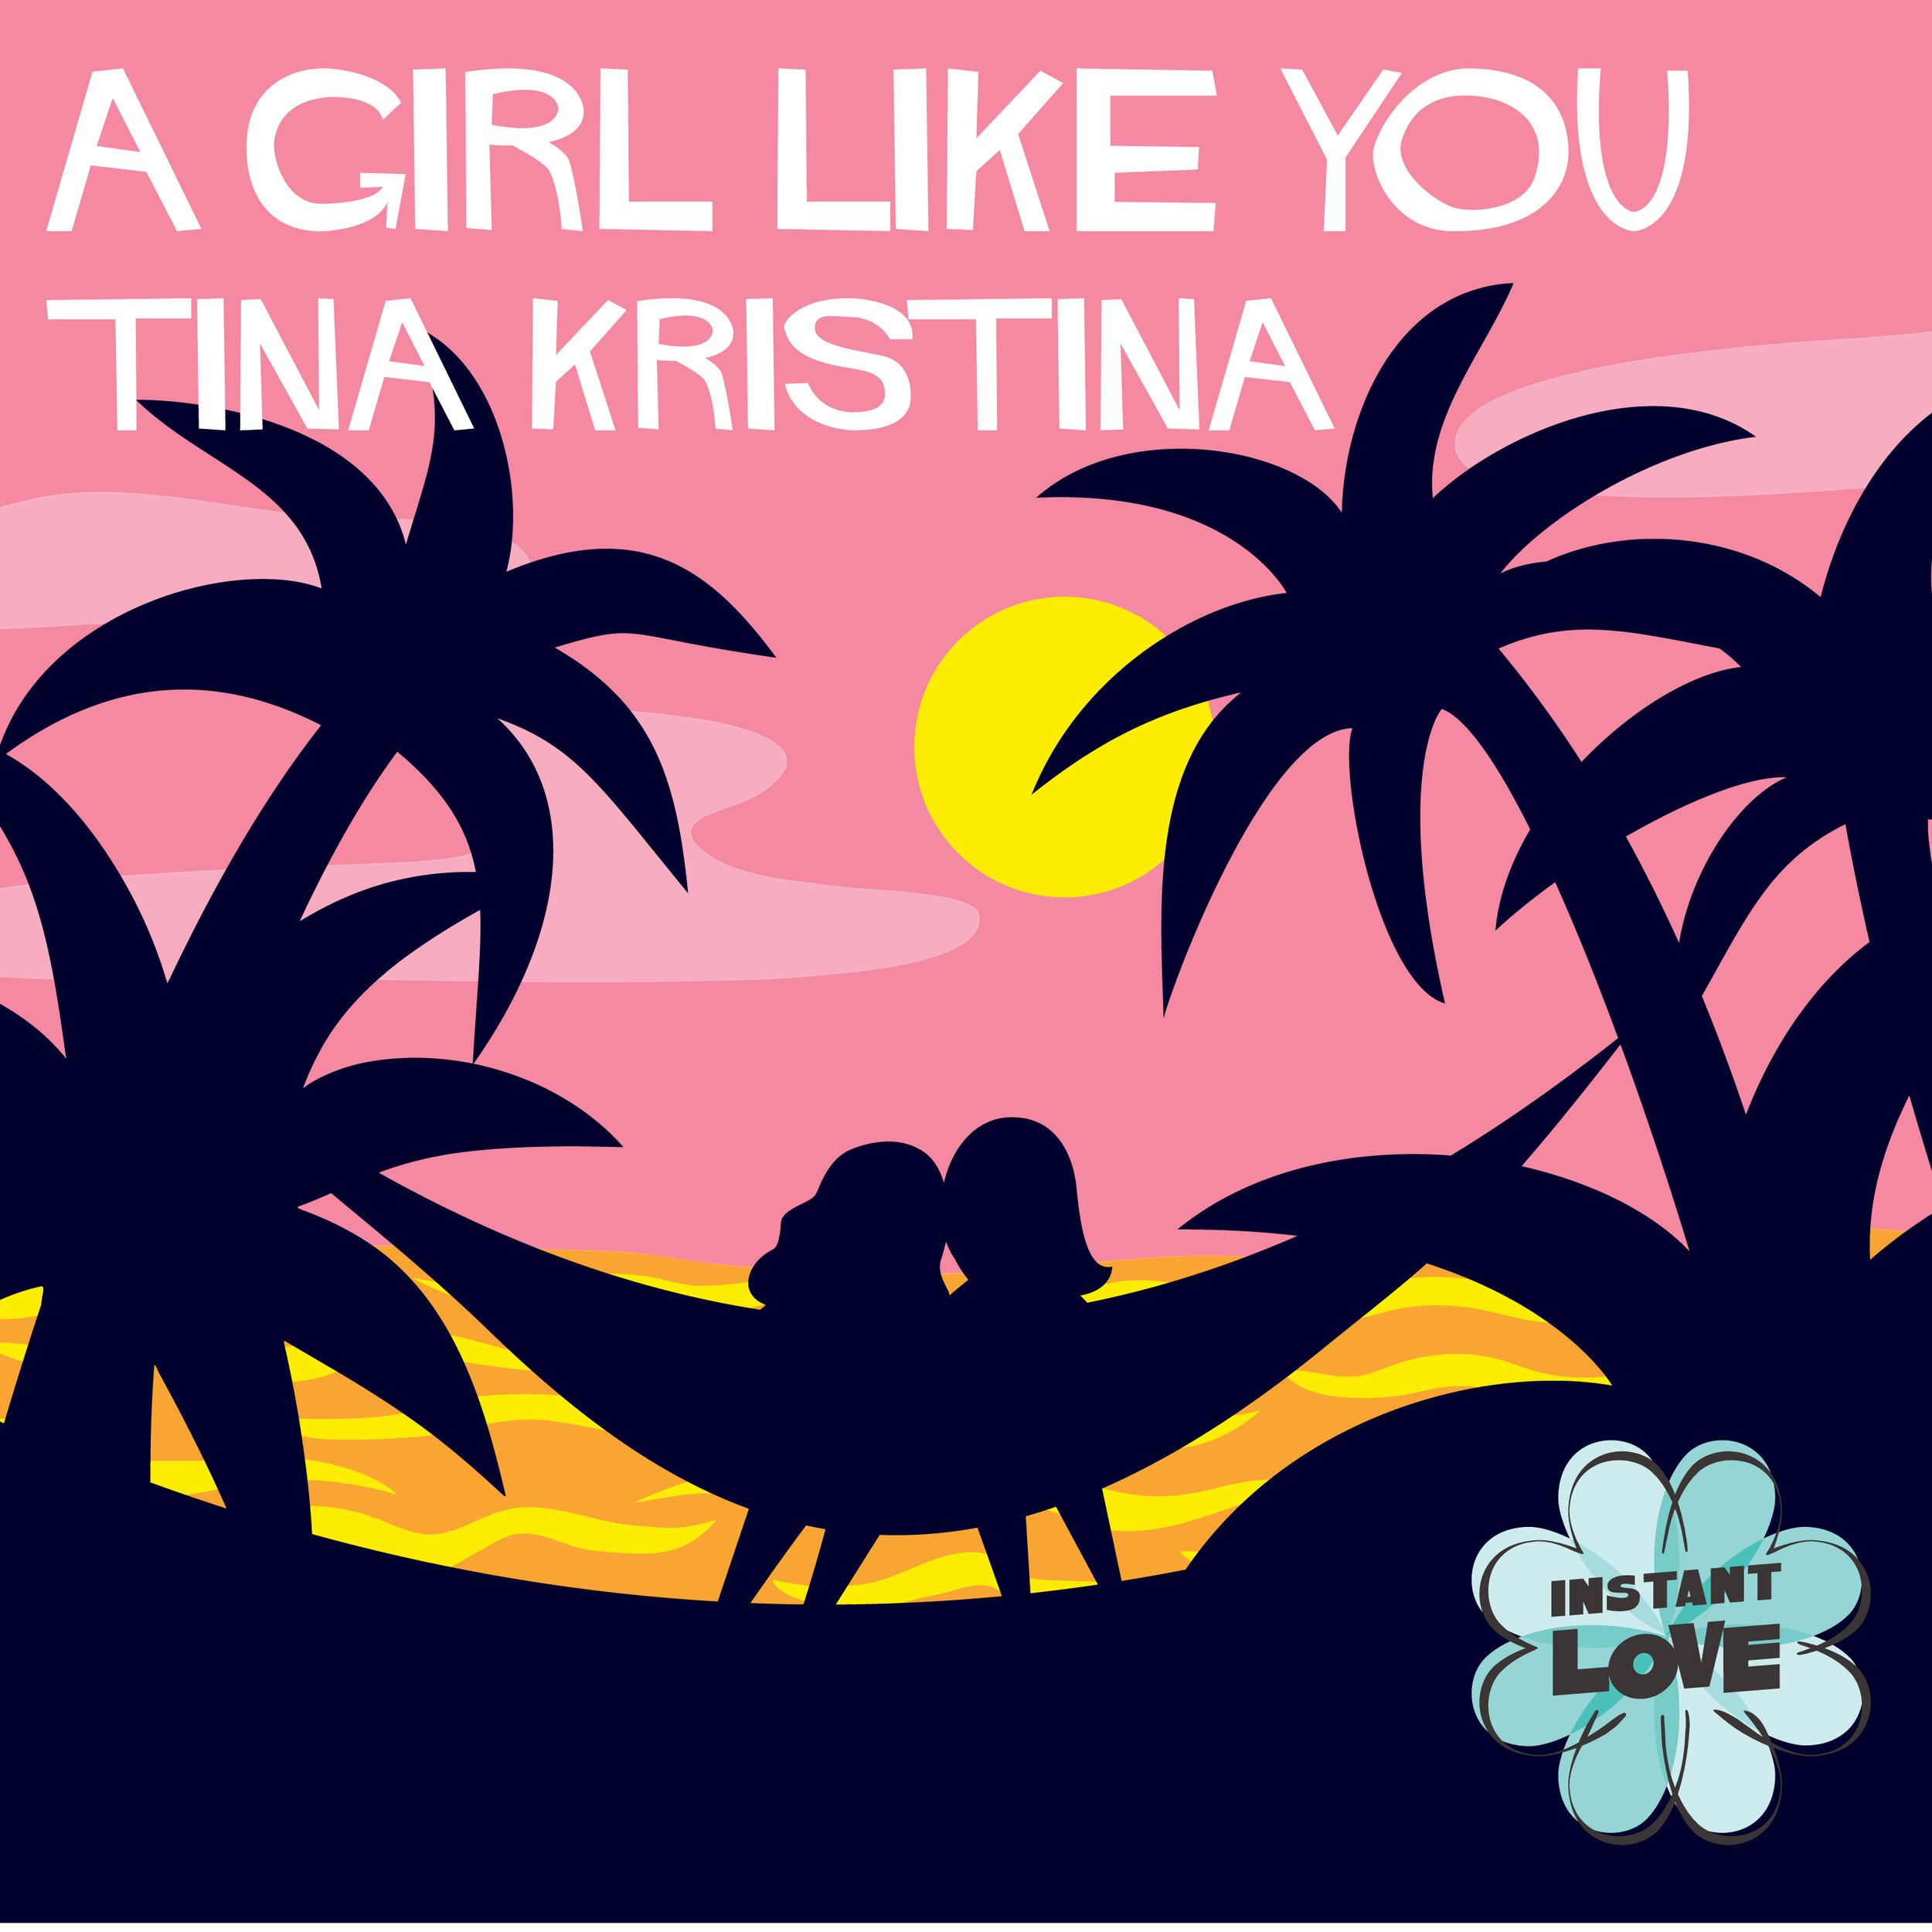 9-8_A Girl Like You_TinaKristina.jpg